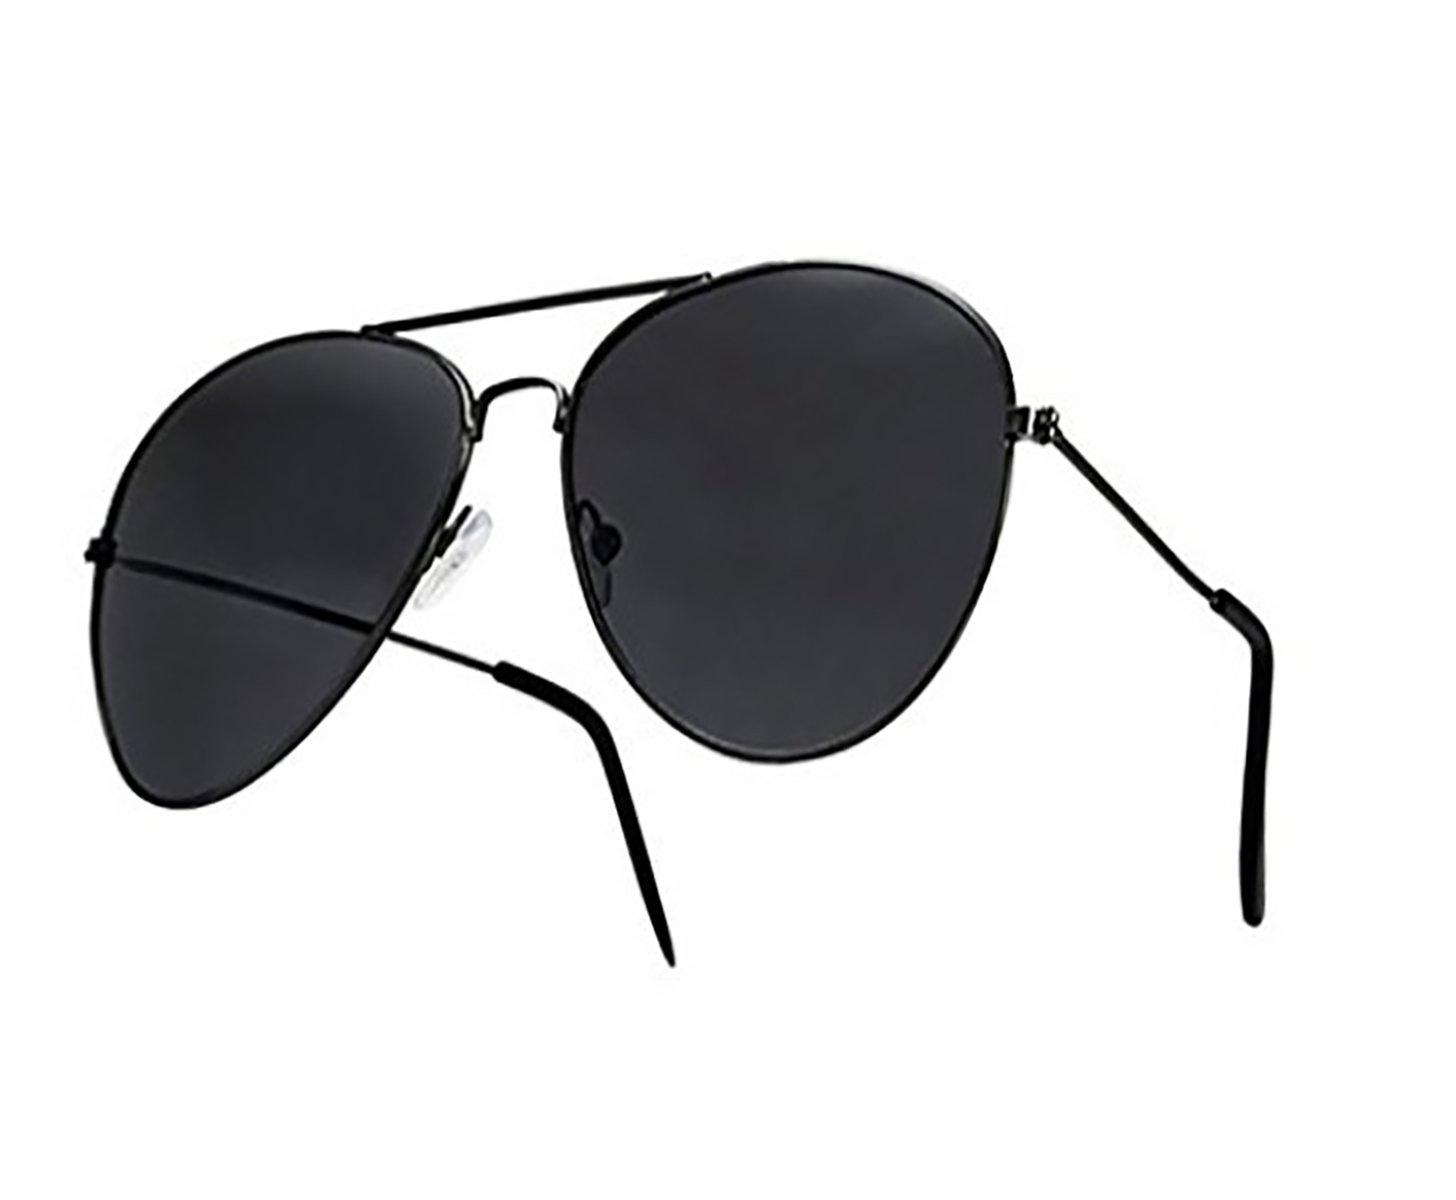 656c1b2168 4sold UNISEX MENS WOMENS 70s Designer Style Unisex Silver Mirror Sunglasses  - UV400 Protection - One